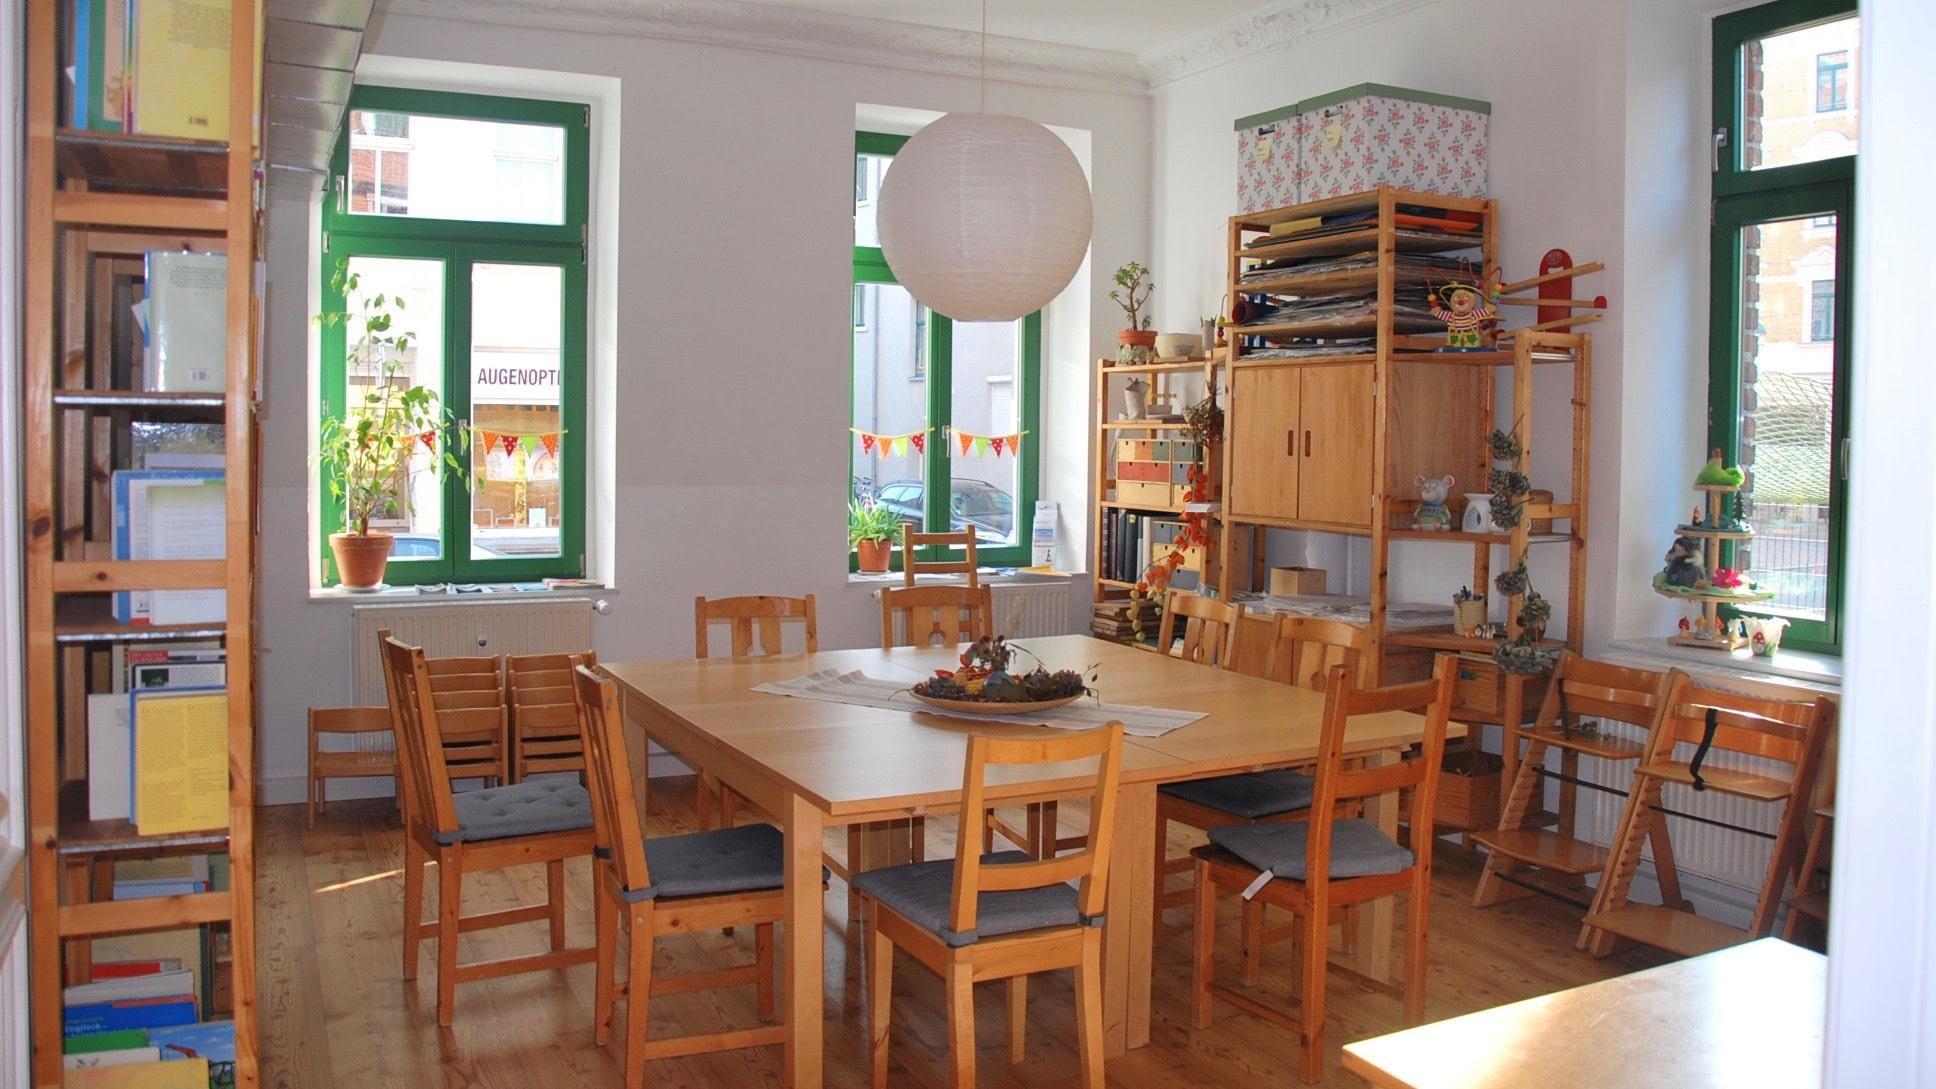 Räume mieten – Lichtblick e.V. – Familienzentrum und FabiMobil